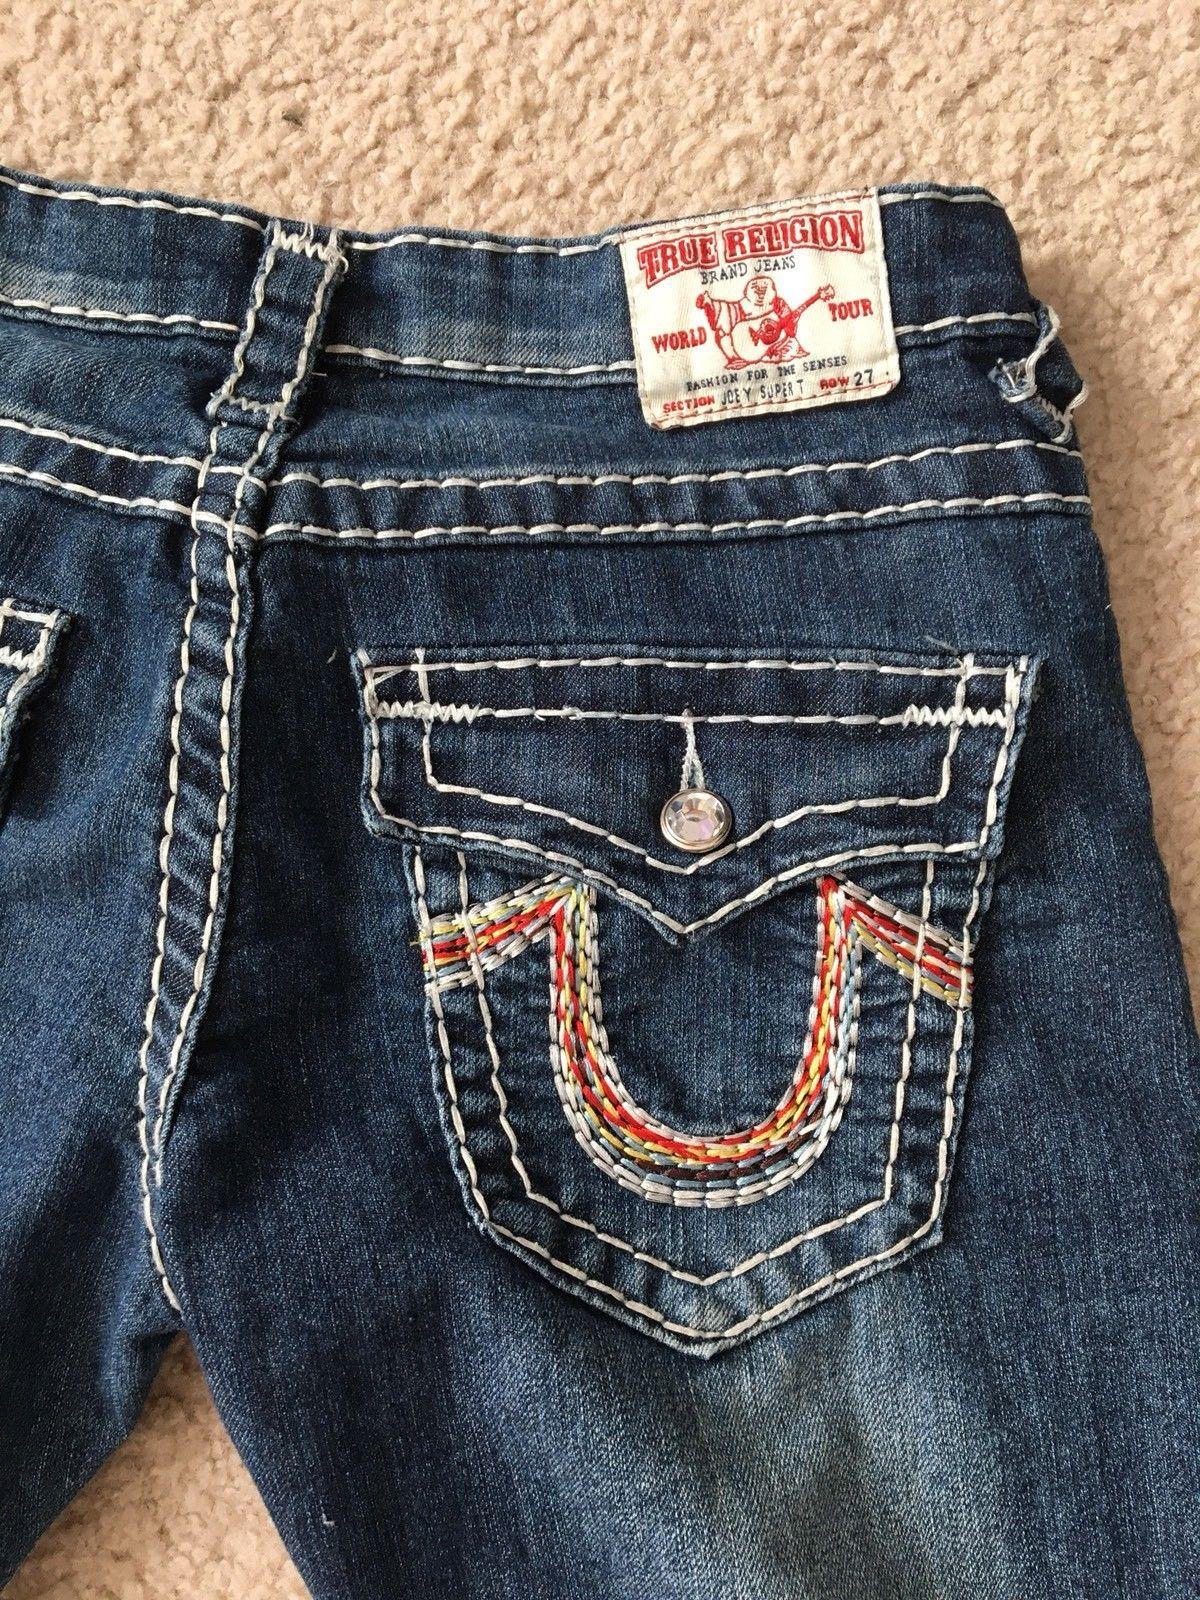 78a82278a True Religion Jeans Joey Super T Size W 27 L 31 Dark Colored Stitch Jeweled  USA